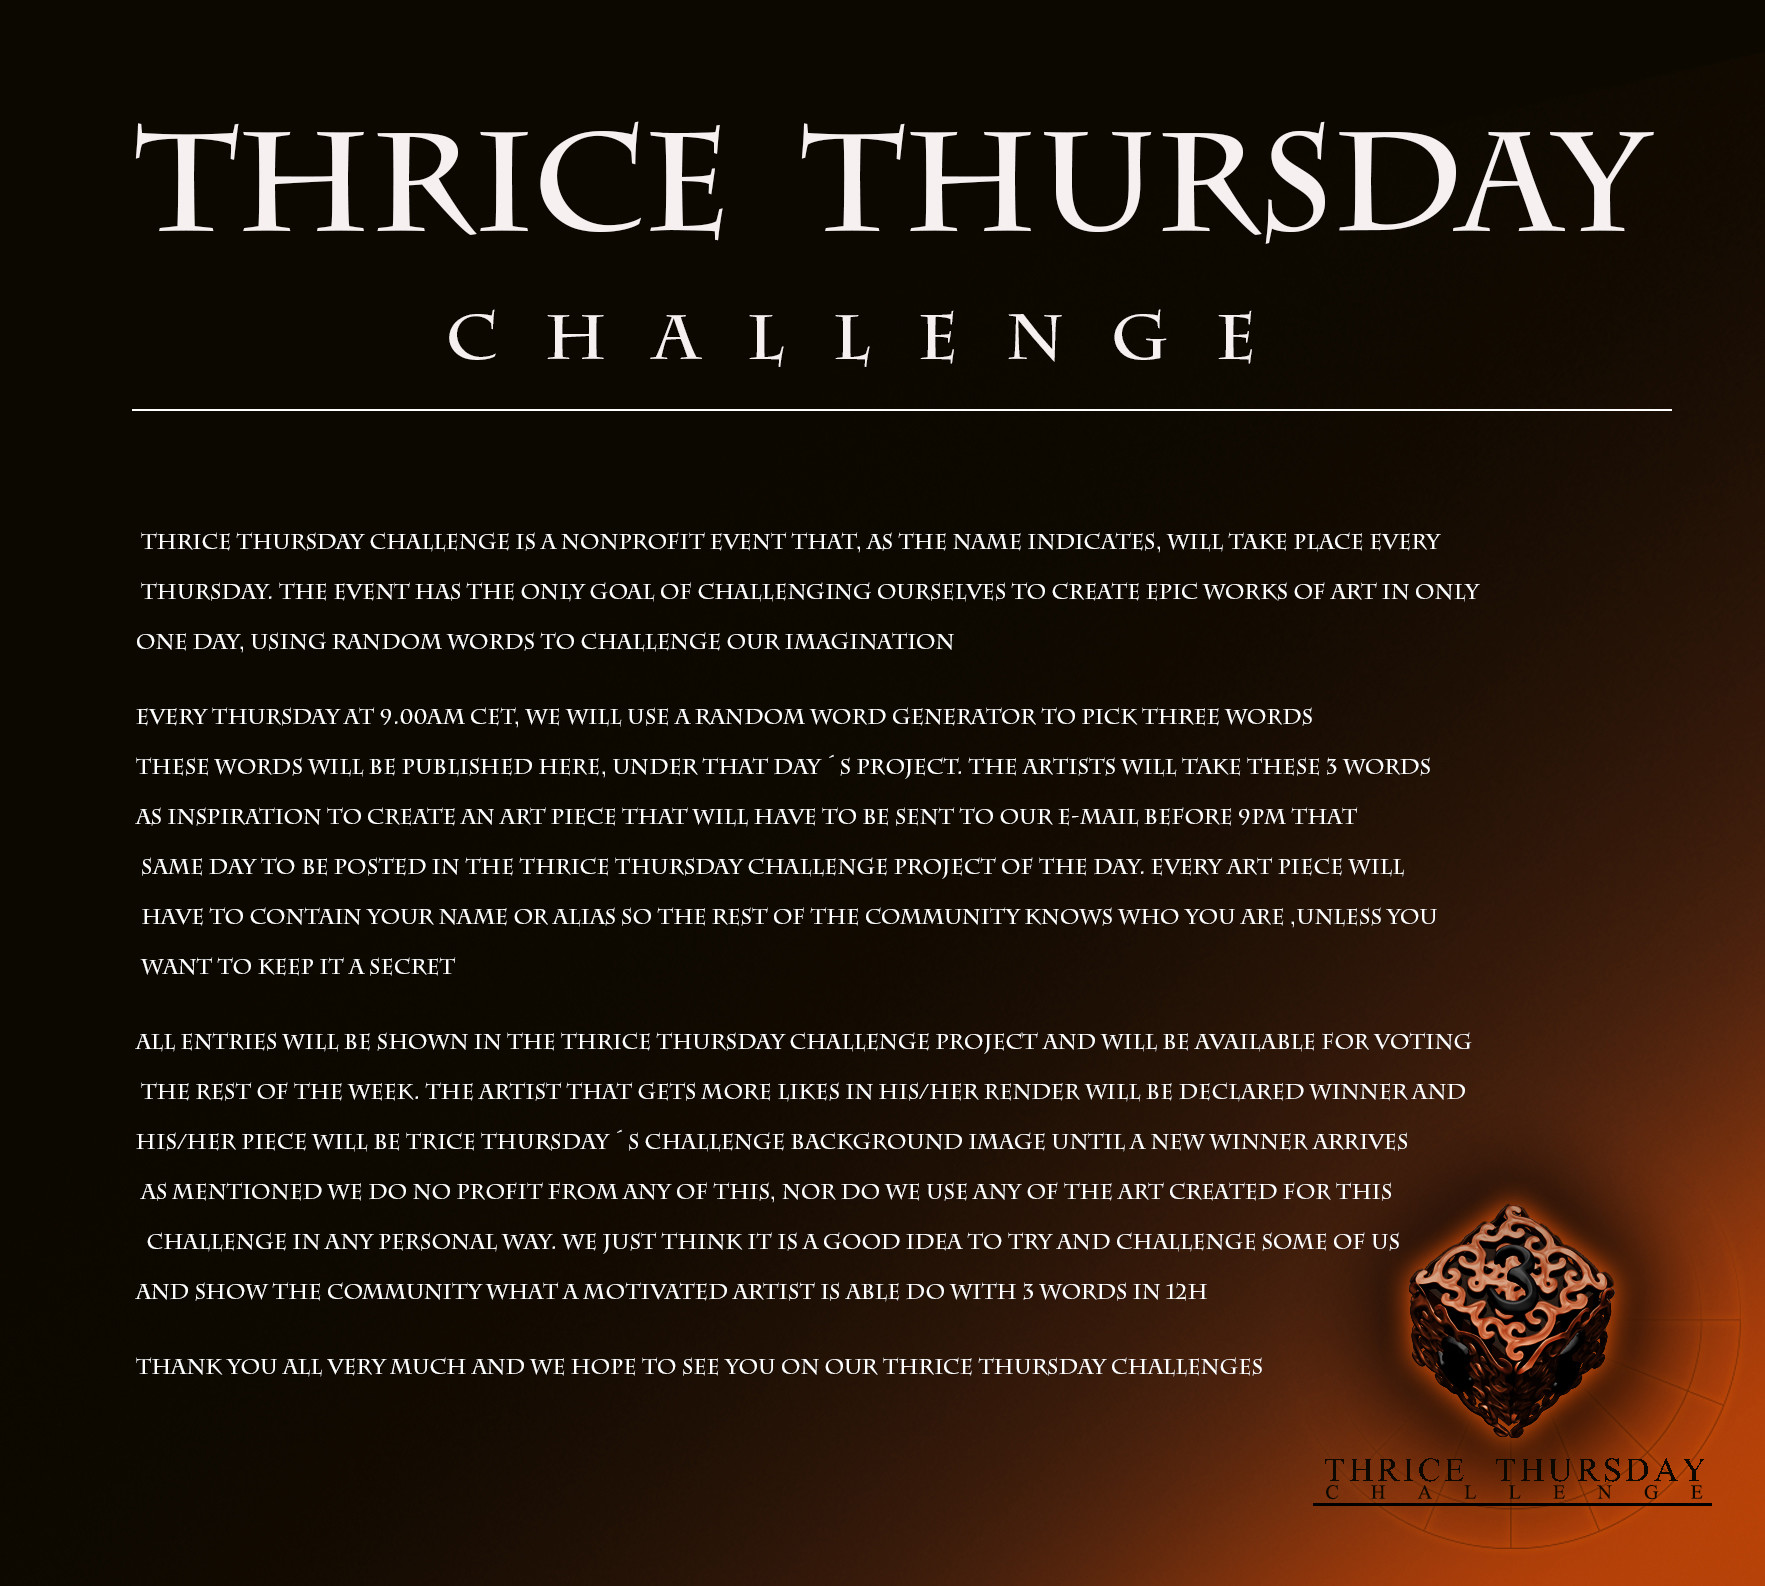 Thrice Thursday - Thrice Thursday Challenge